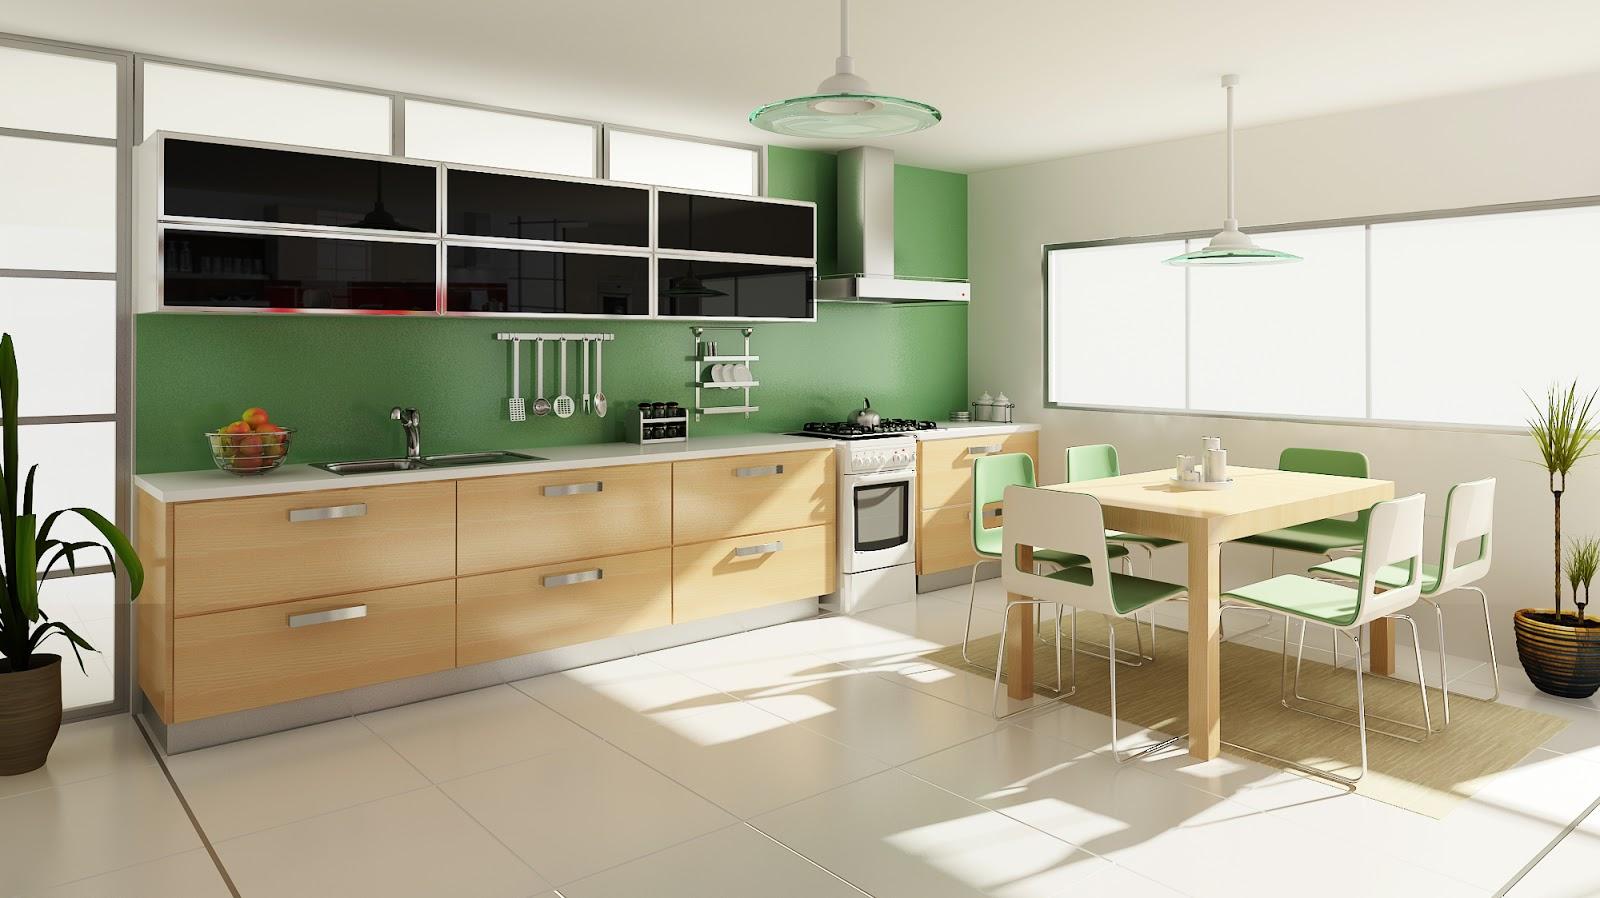 Arquitectura en im genes 3d dise o de interiores cocinas for Diseno interior cocina